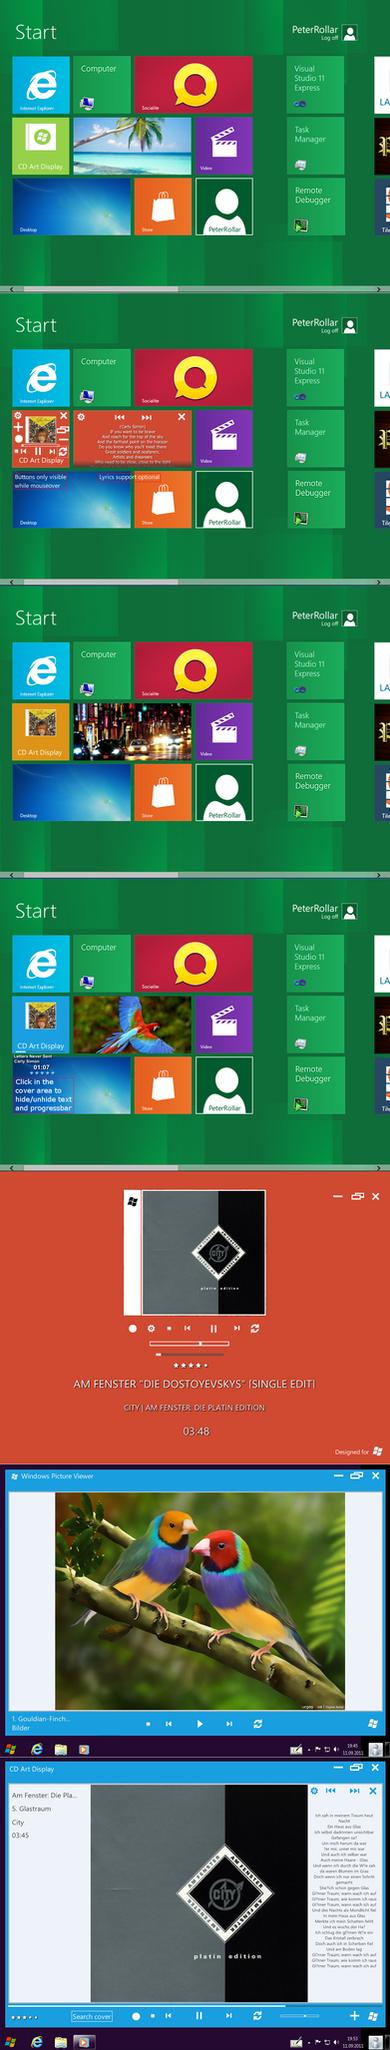 Windows8 tile for CD Art Display by PeterRollar